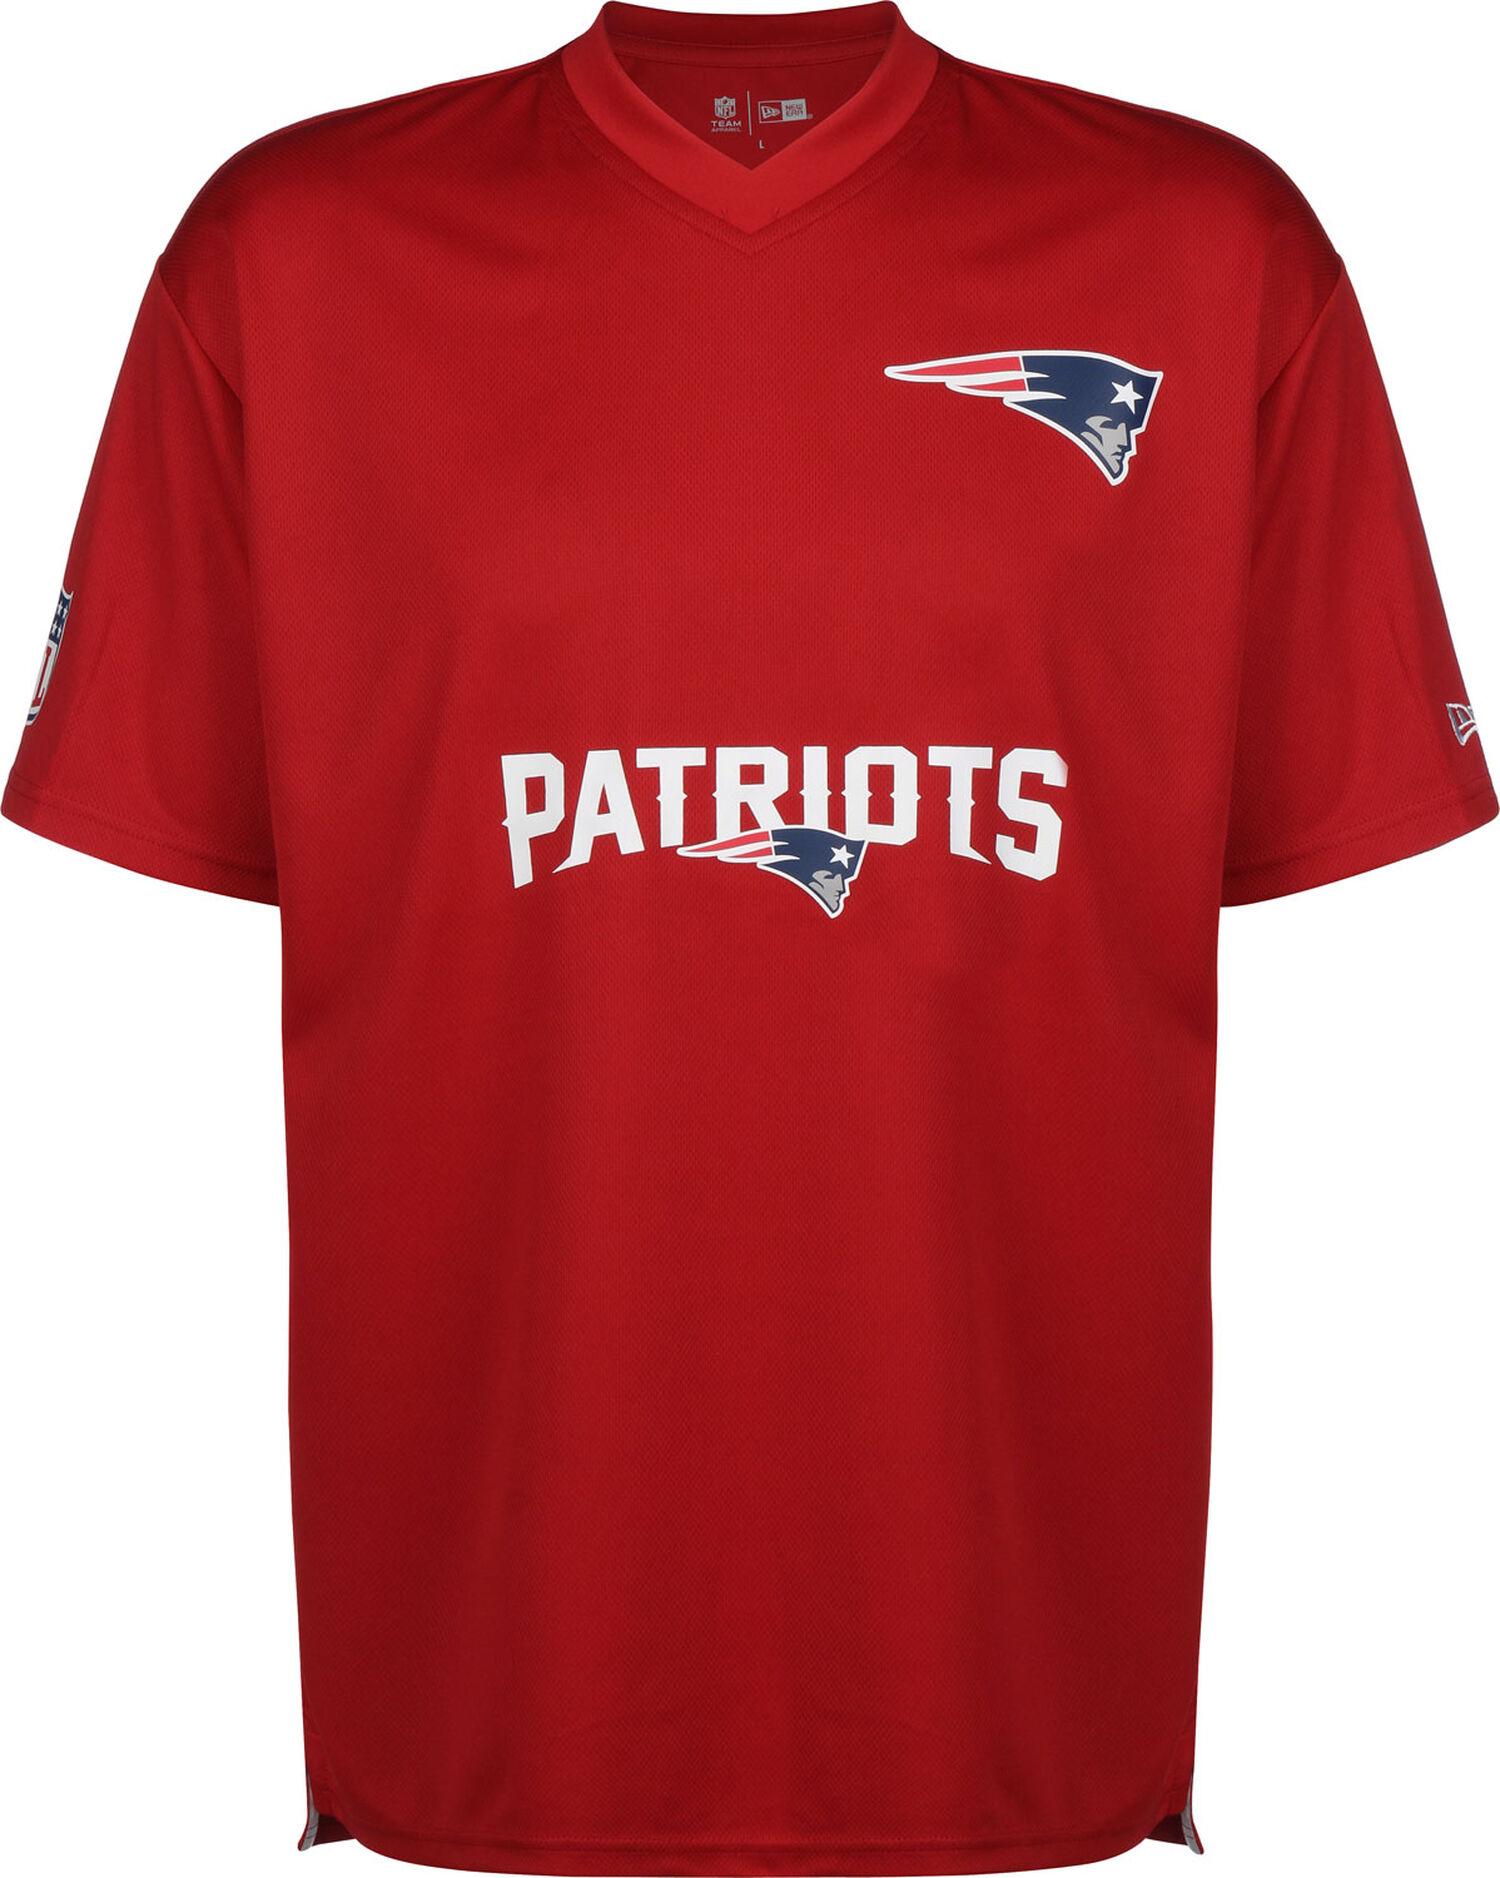 NFL Wordmark Oversized England Patriots